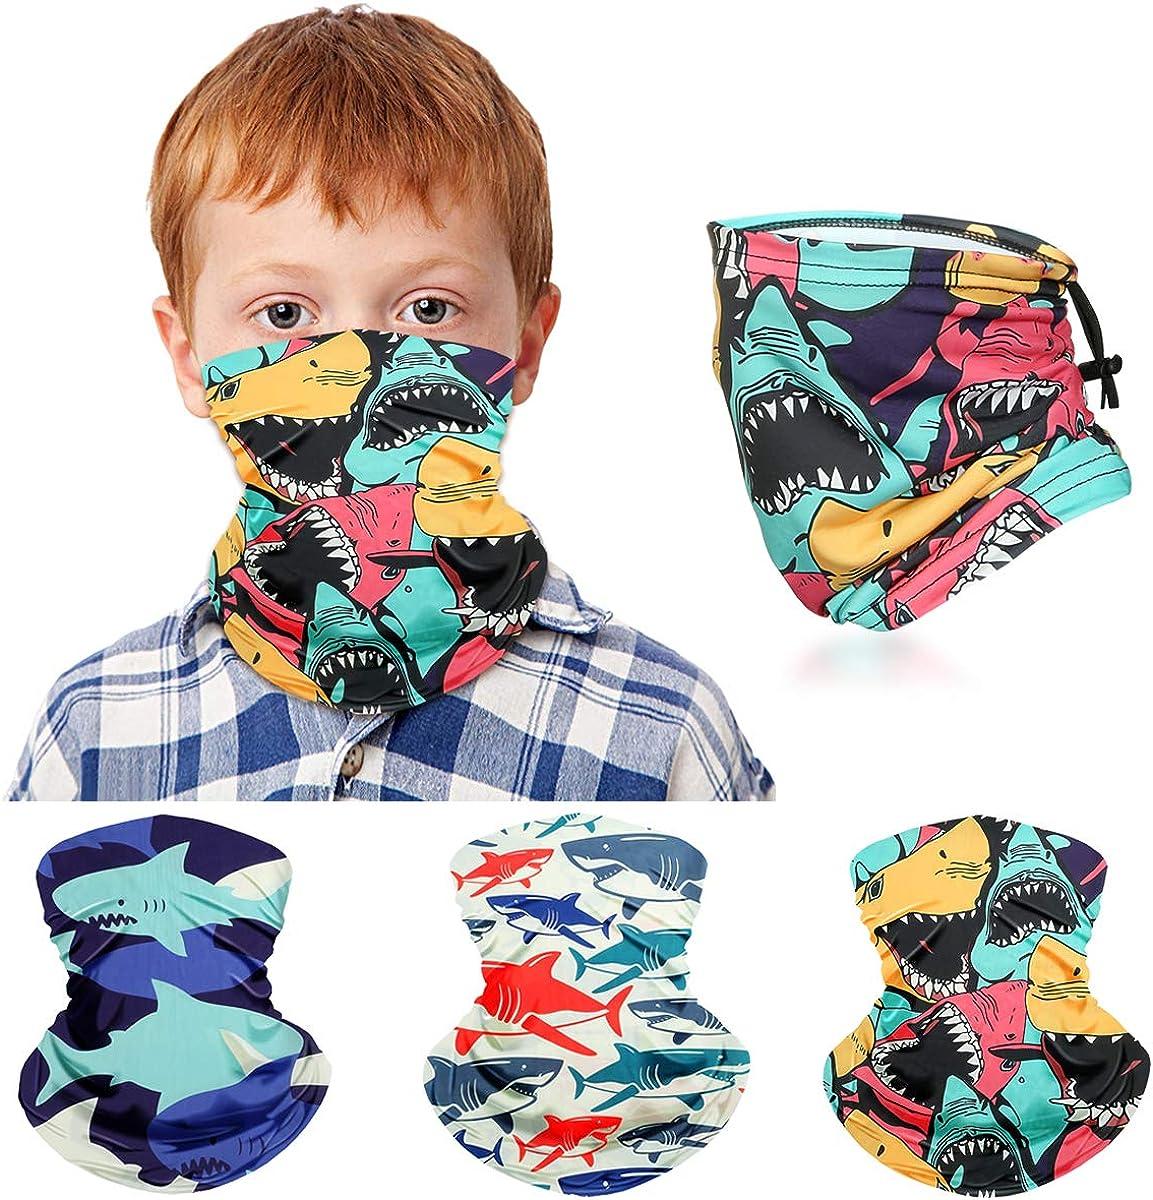 Kids Neck Gaiter Face Maskfor Boys Girls Face Cover Scarf Bandana Balaclava Adjustable Reusable Washable 3 Pack